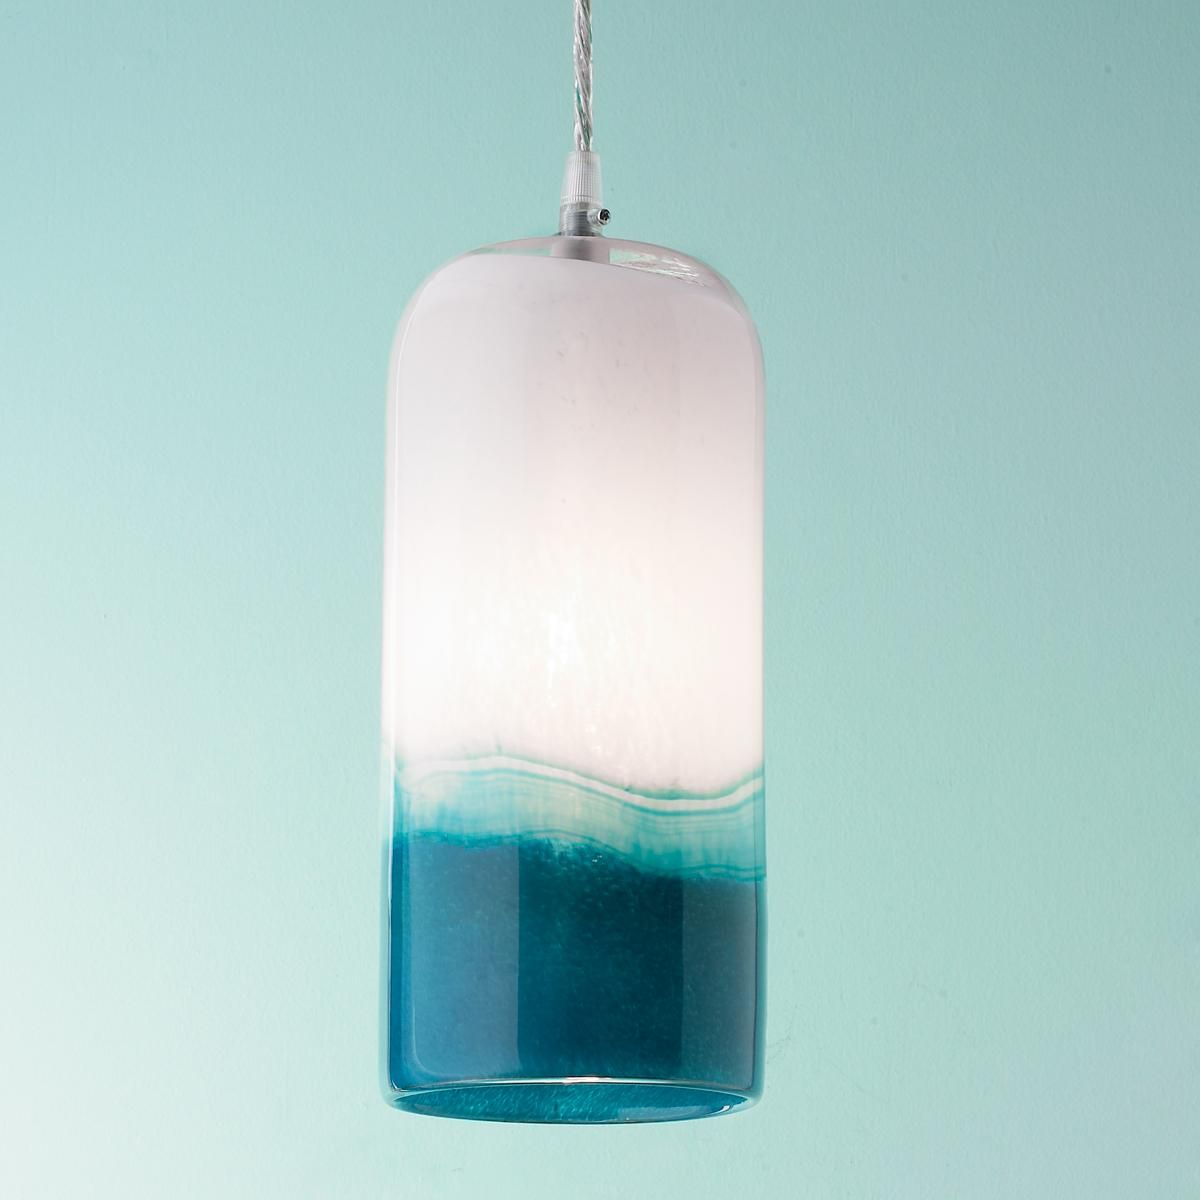 turquoise pendant lighting. Blues Art Glass Pendant Light Turquoise Lighting